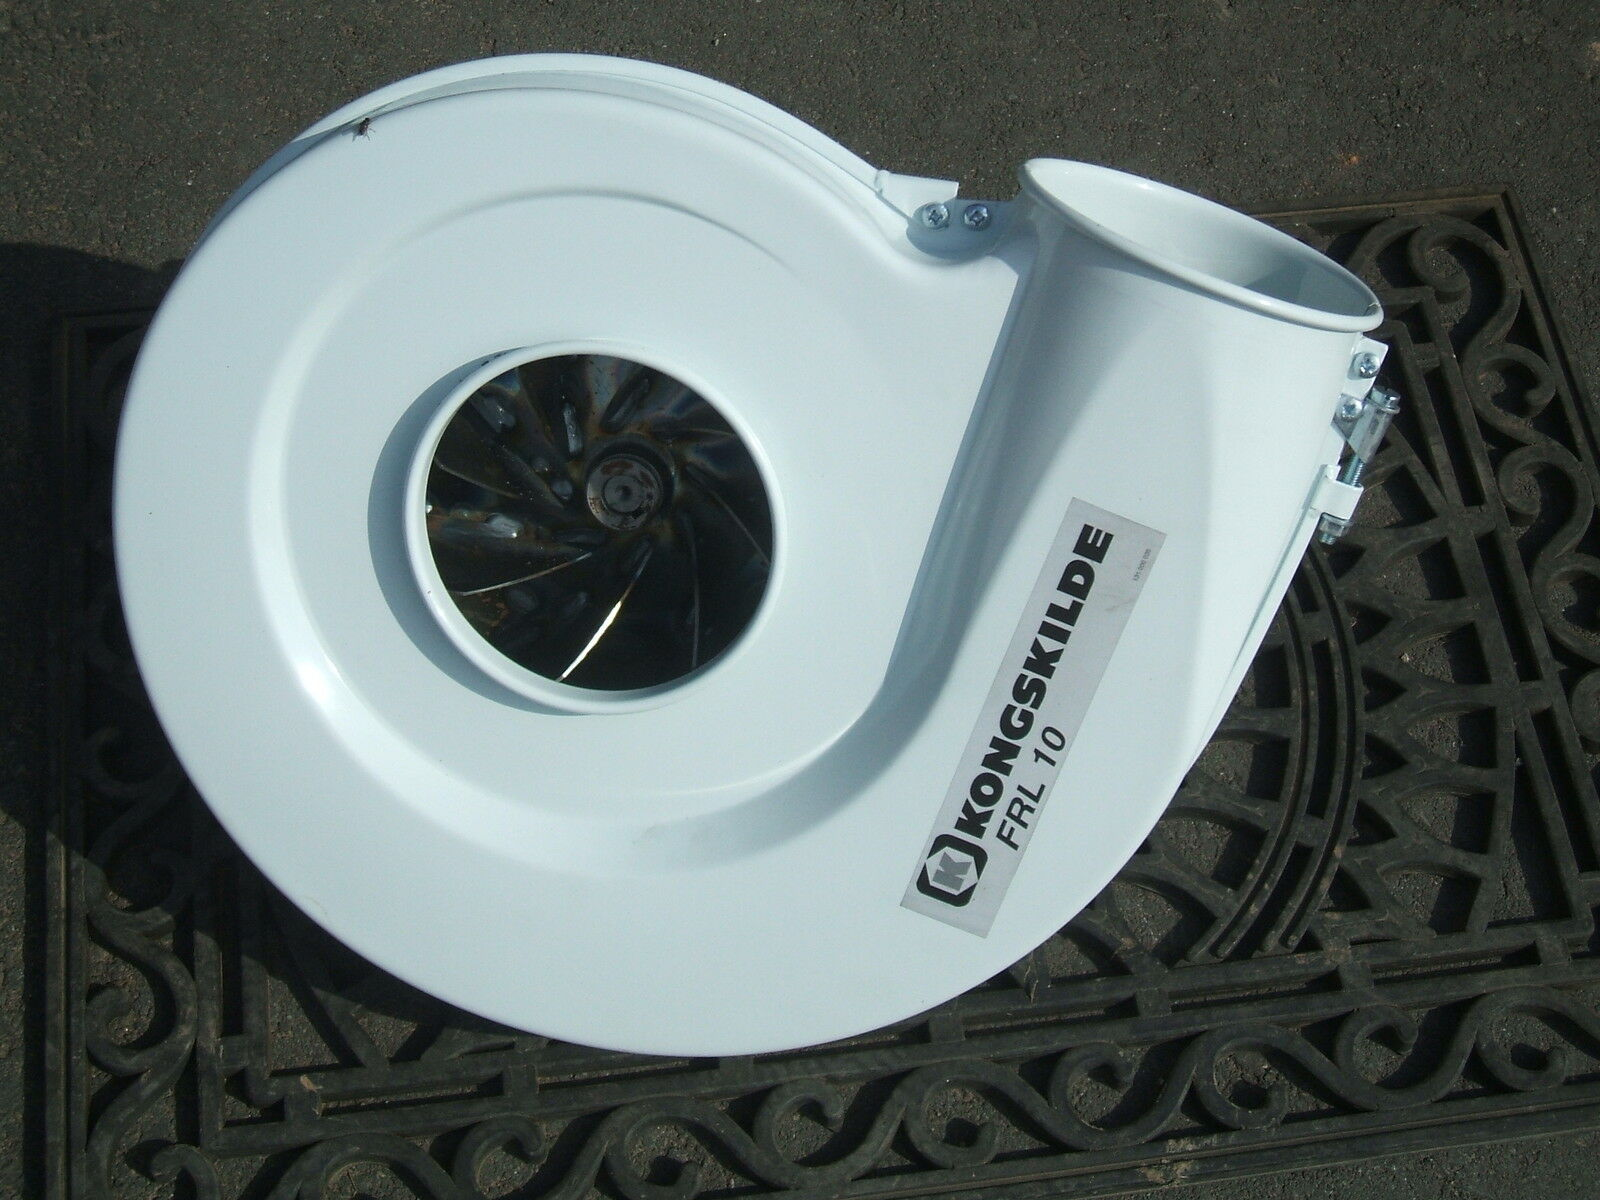 Recycling Plastic Blower : Kongskilde blower clip grain augers recycling fan tractor